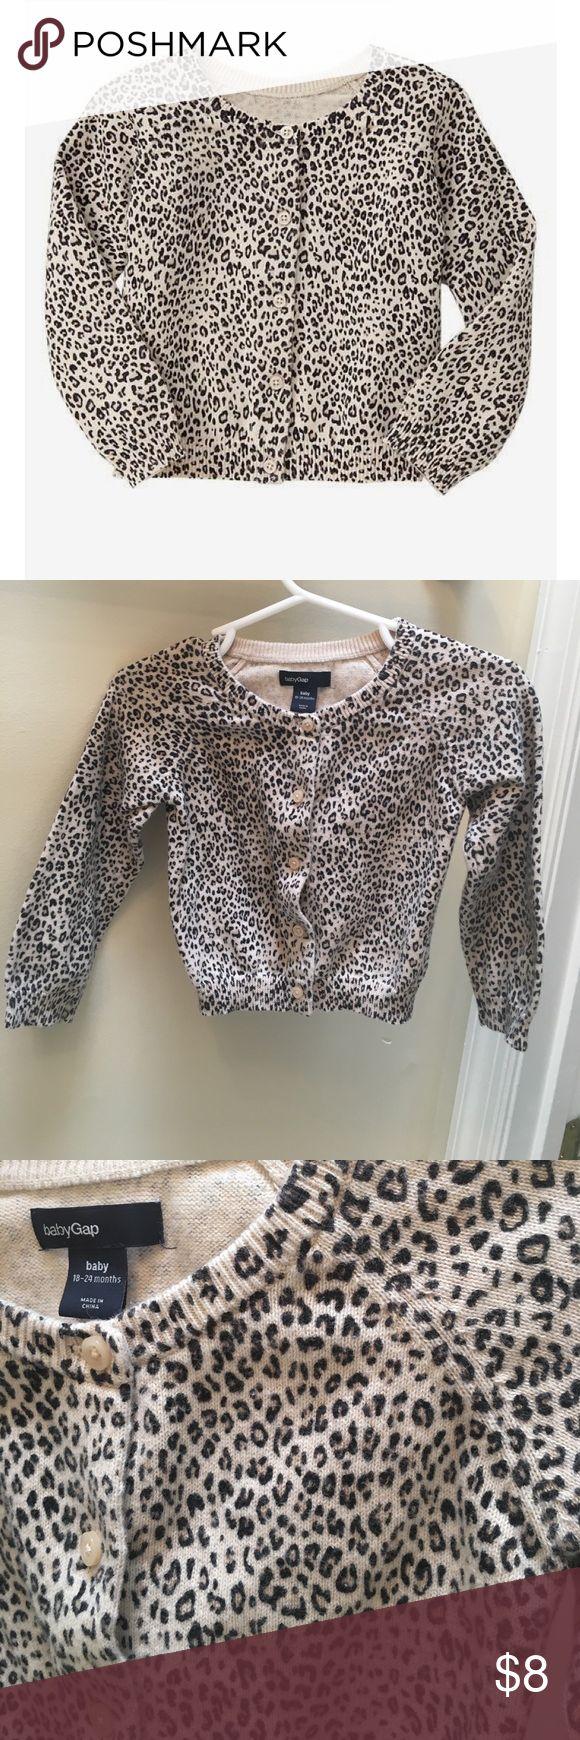 Baby Gap Cheetah Print Cardigan Baby Gap Cheetah Print Cardigan. Only worn a few times GAP Shirts & Tops Sweaters